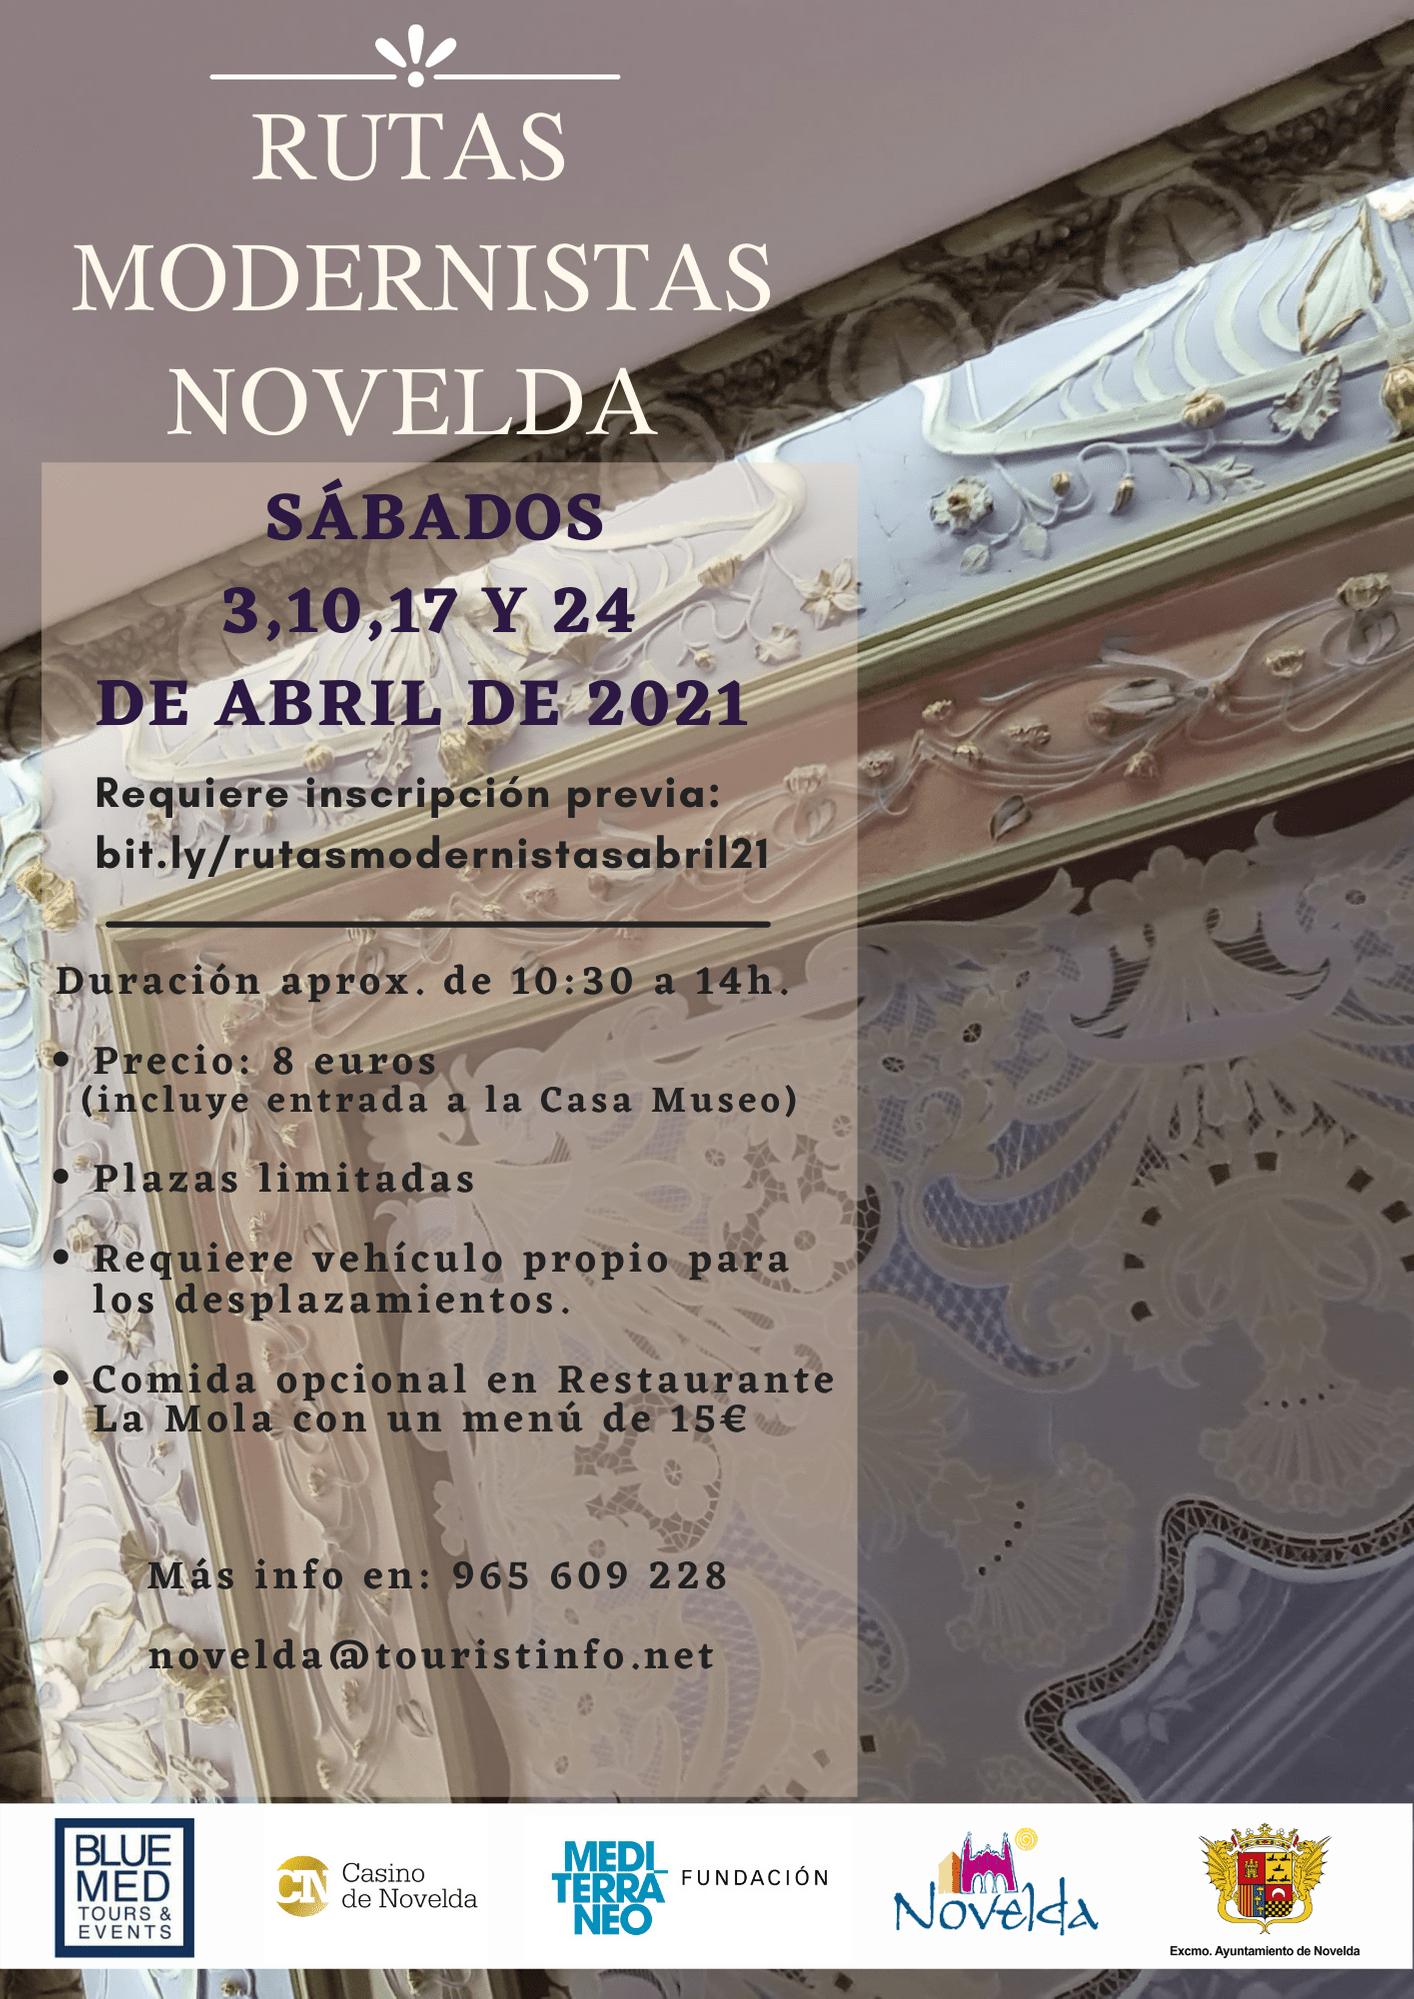 Ayuntamiento de Novelda Rutas-moderistas-abril-2021 Rutas Modernistas Novelda